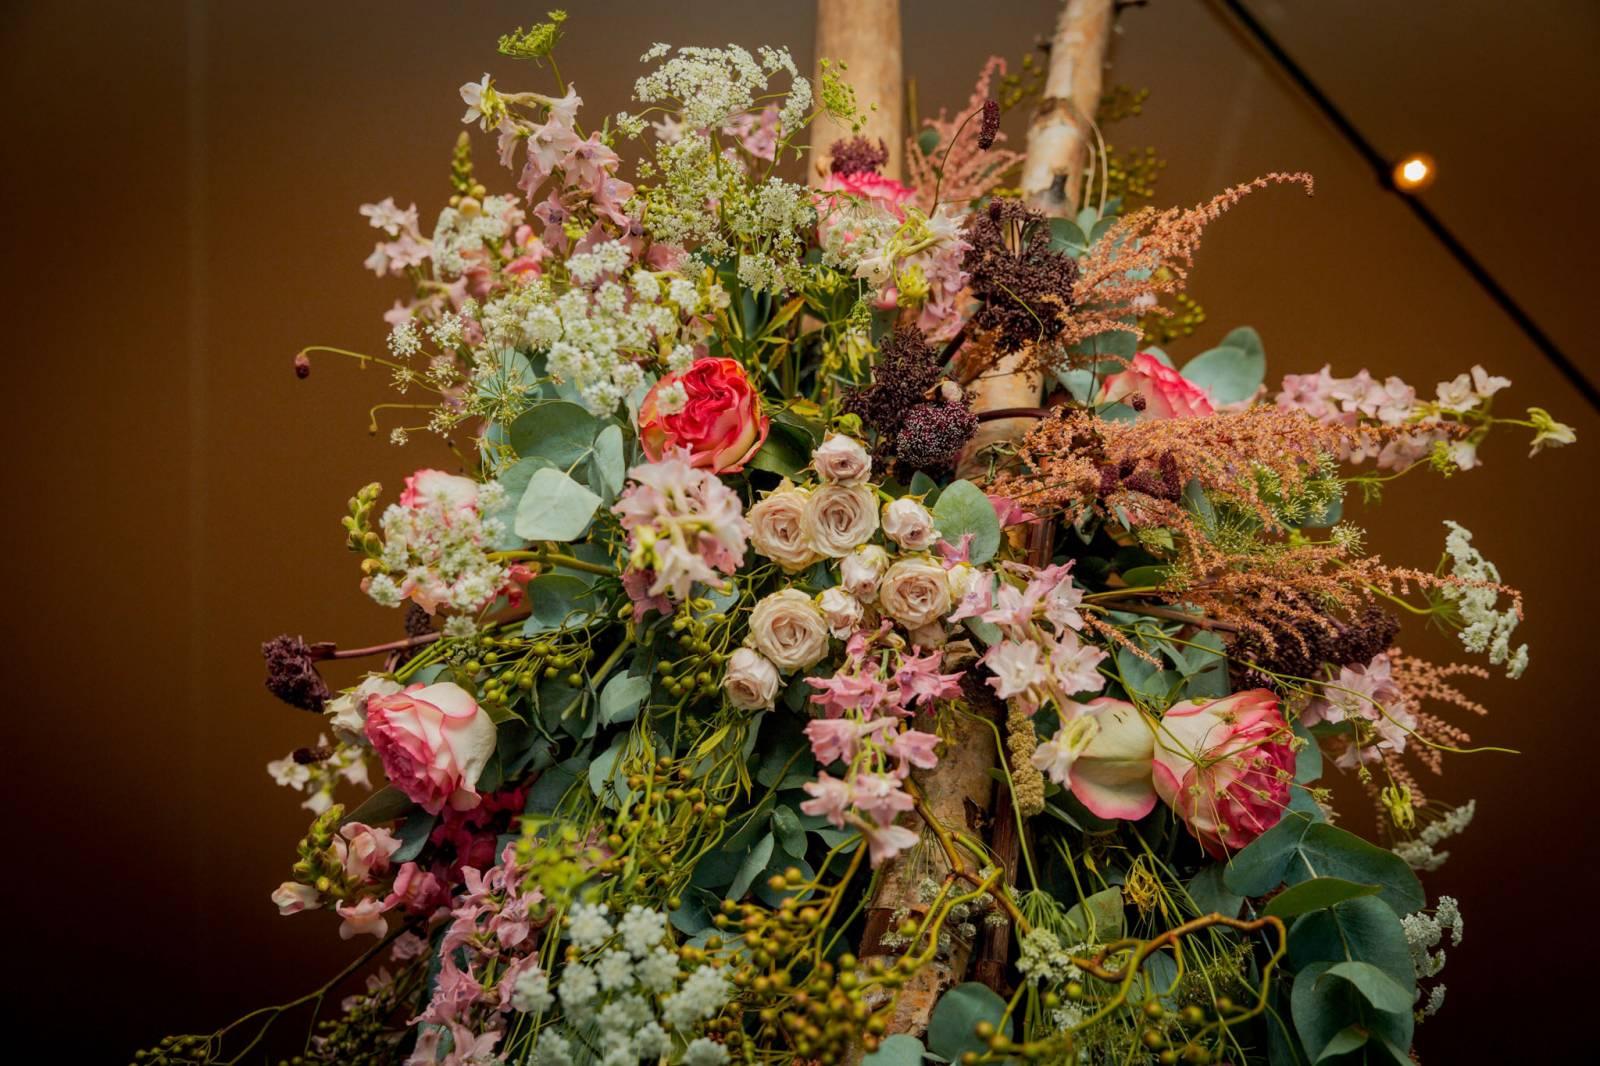 Senth Concept - 5 - Claudia Neuckermans - House of Weddings